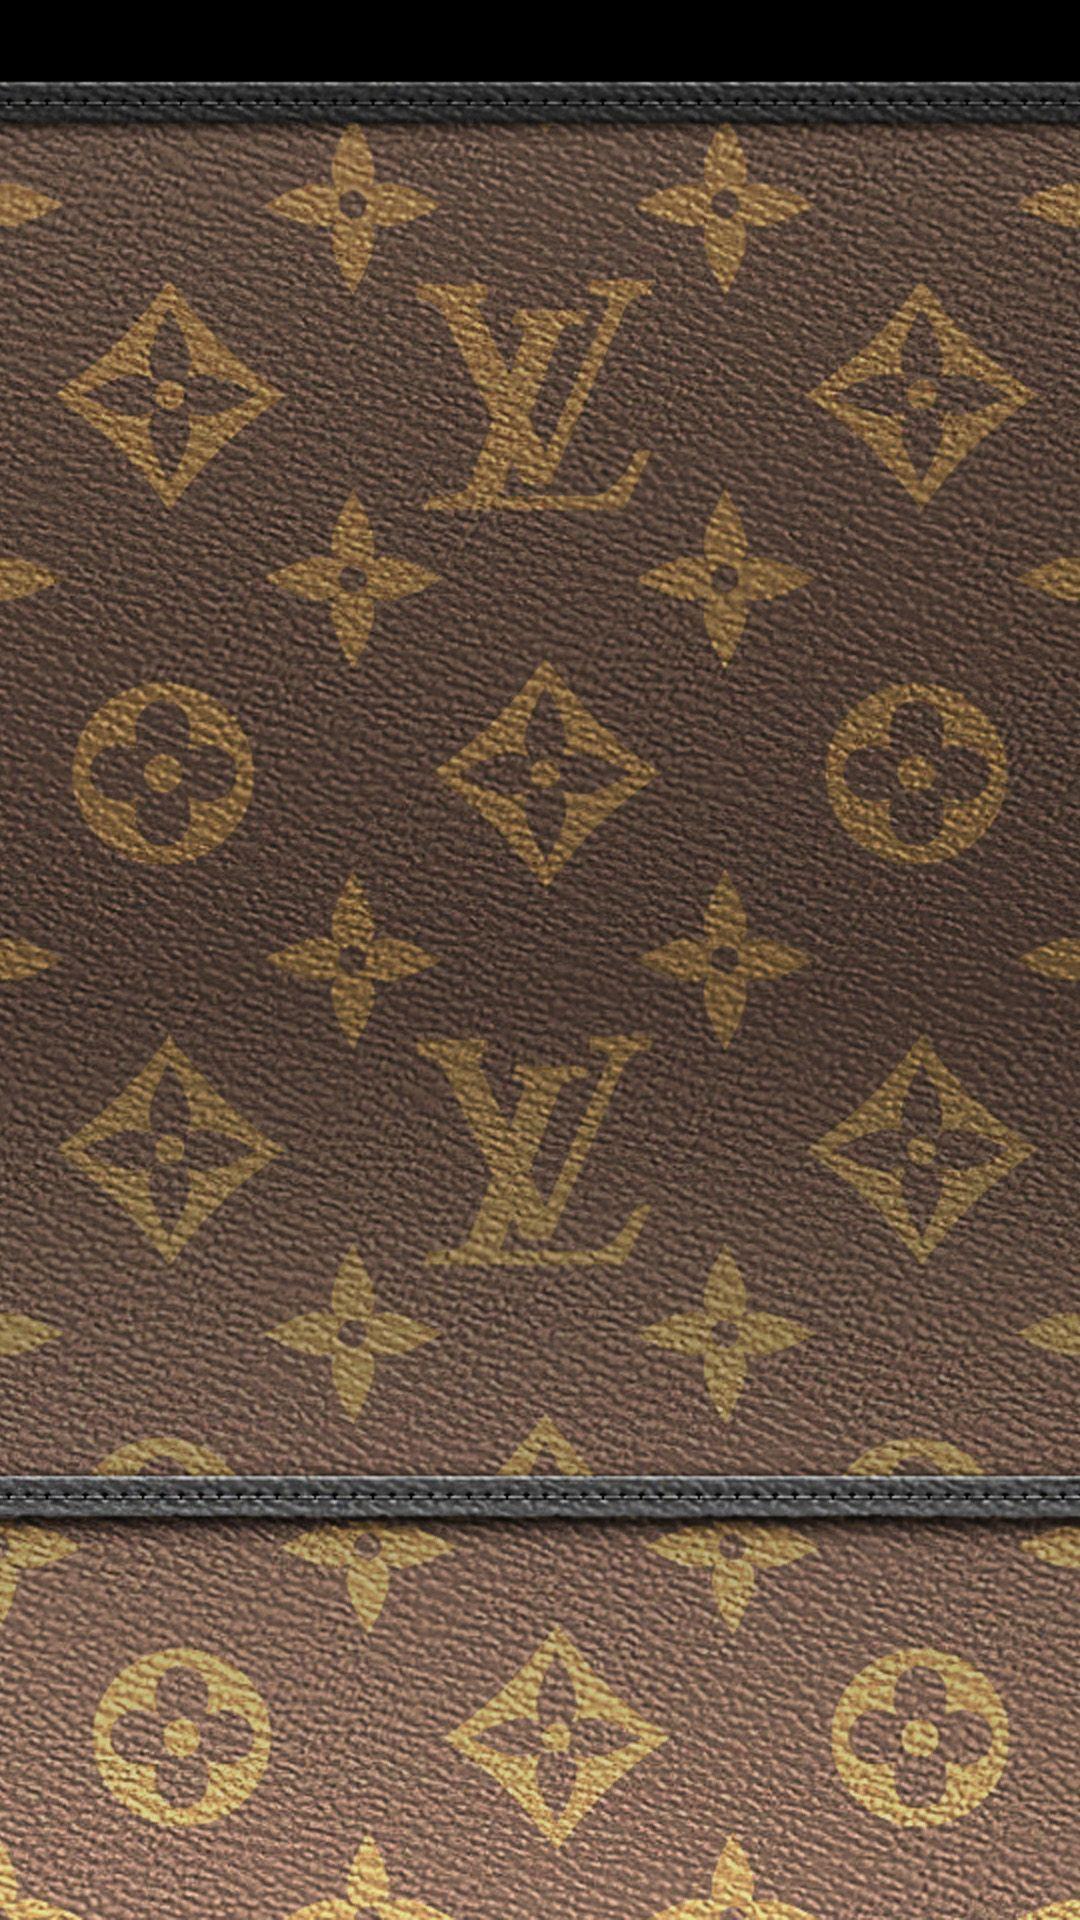 Burberry Wallpaper Iphone X Louis Vuitton Hd Wallpapers Group 61